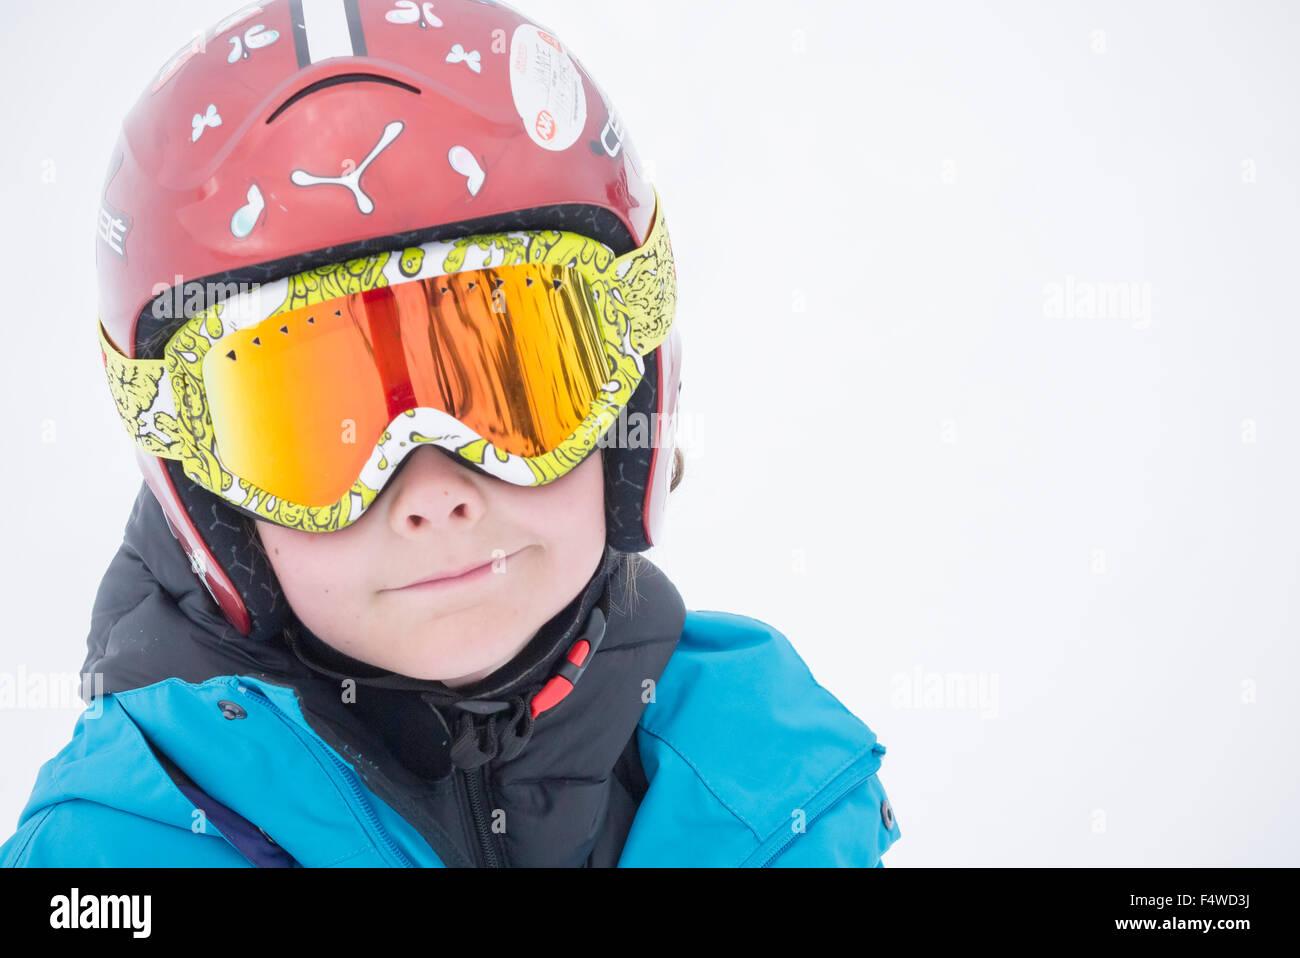 Portrait of boy (10-11) wearing helmet and ski goggles - Stock Image